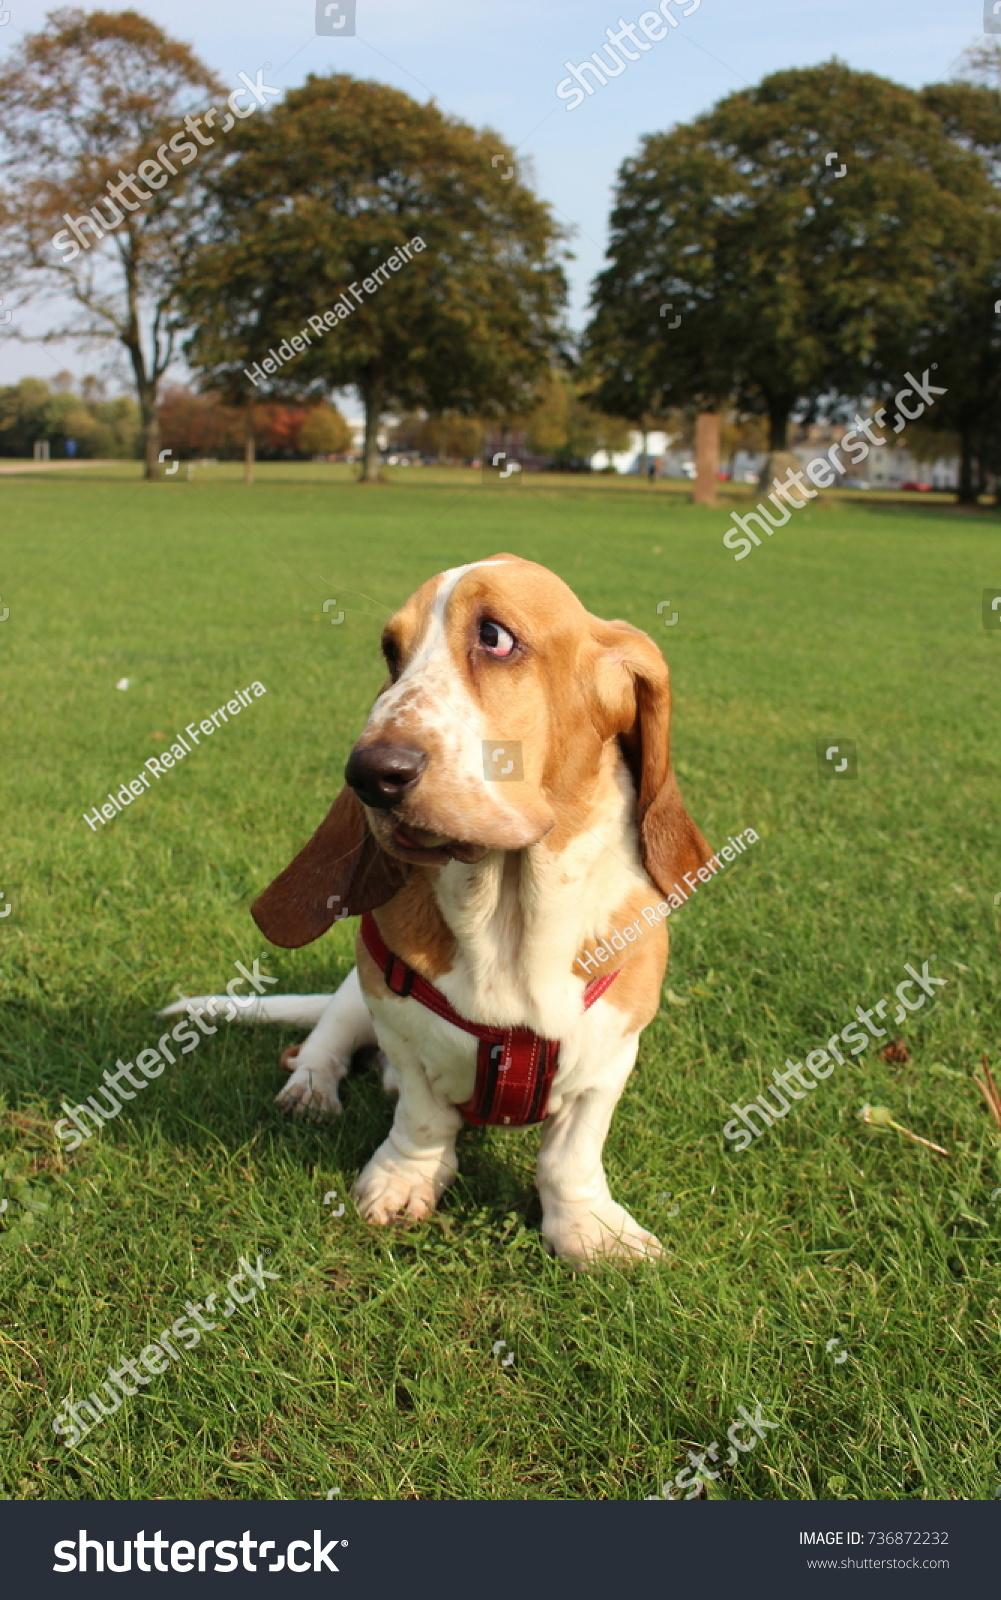 Funny Basset Hound Dog On Grass Stock Photo Edit Now 736872232